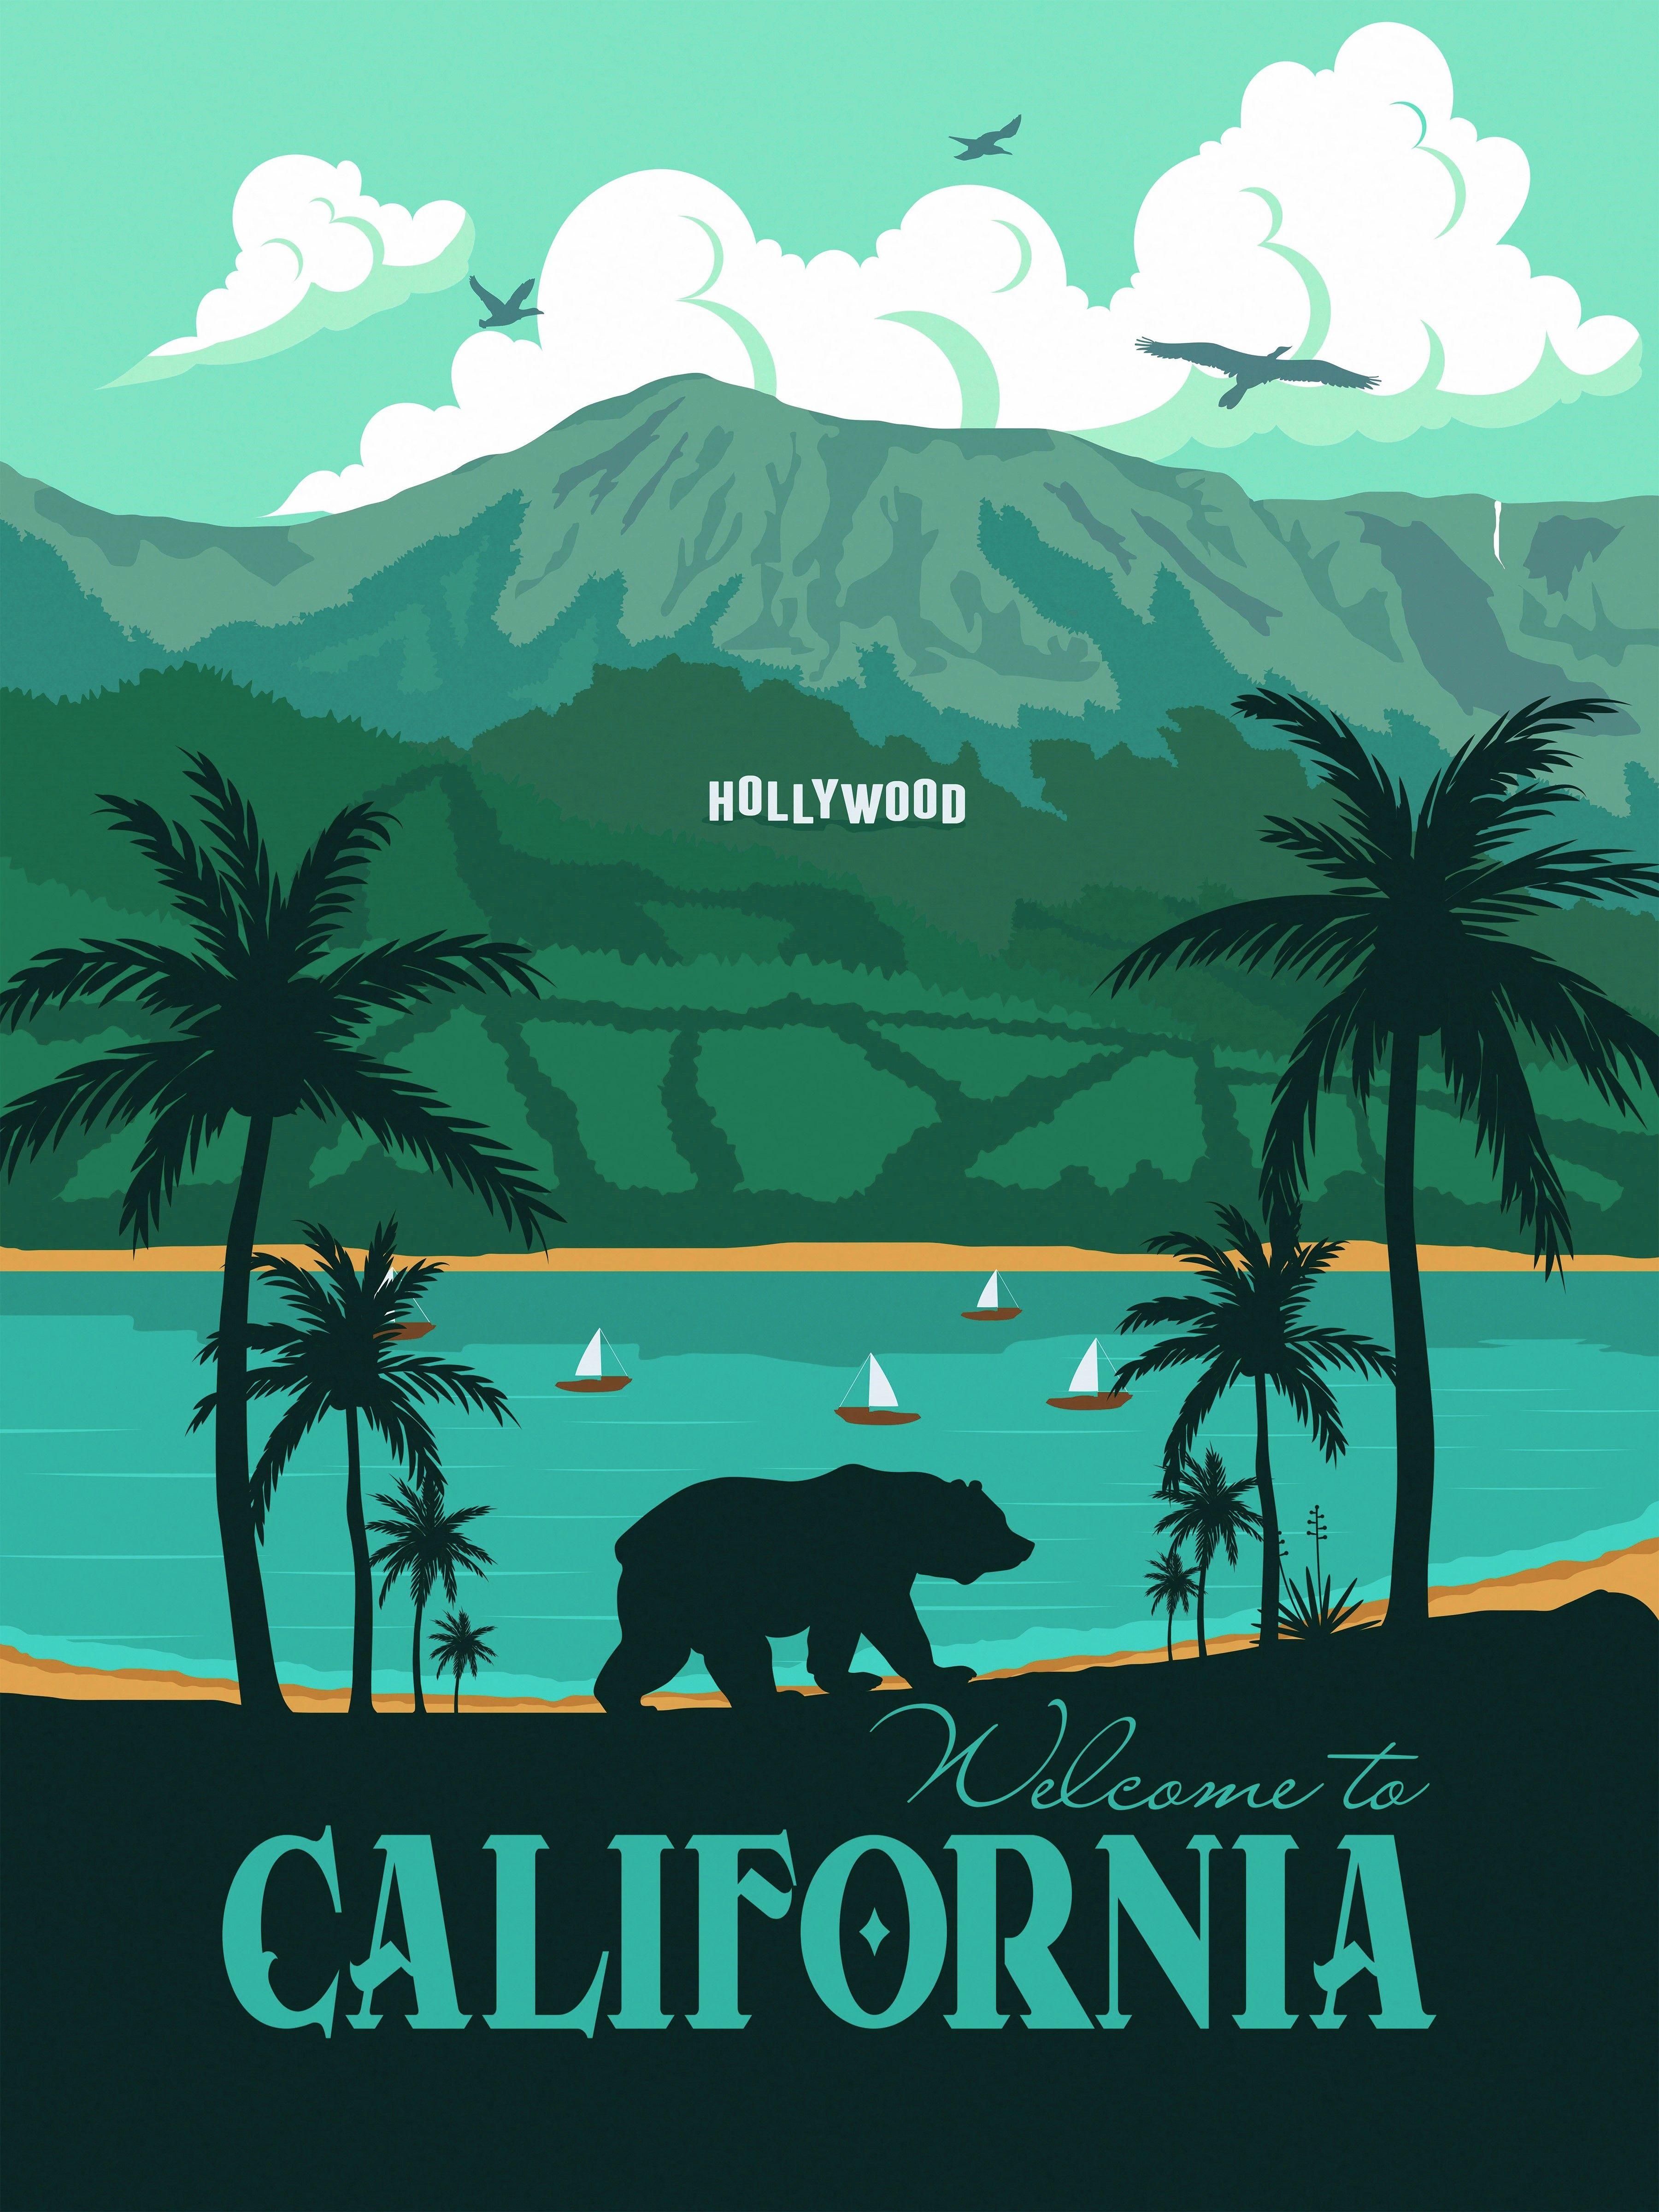 california travel poster landscape los angeles hollywood vintage wall art minimalism bear republic retro travel poster travel posters los angeles travel poster